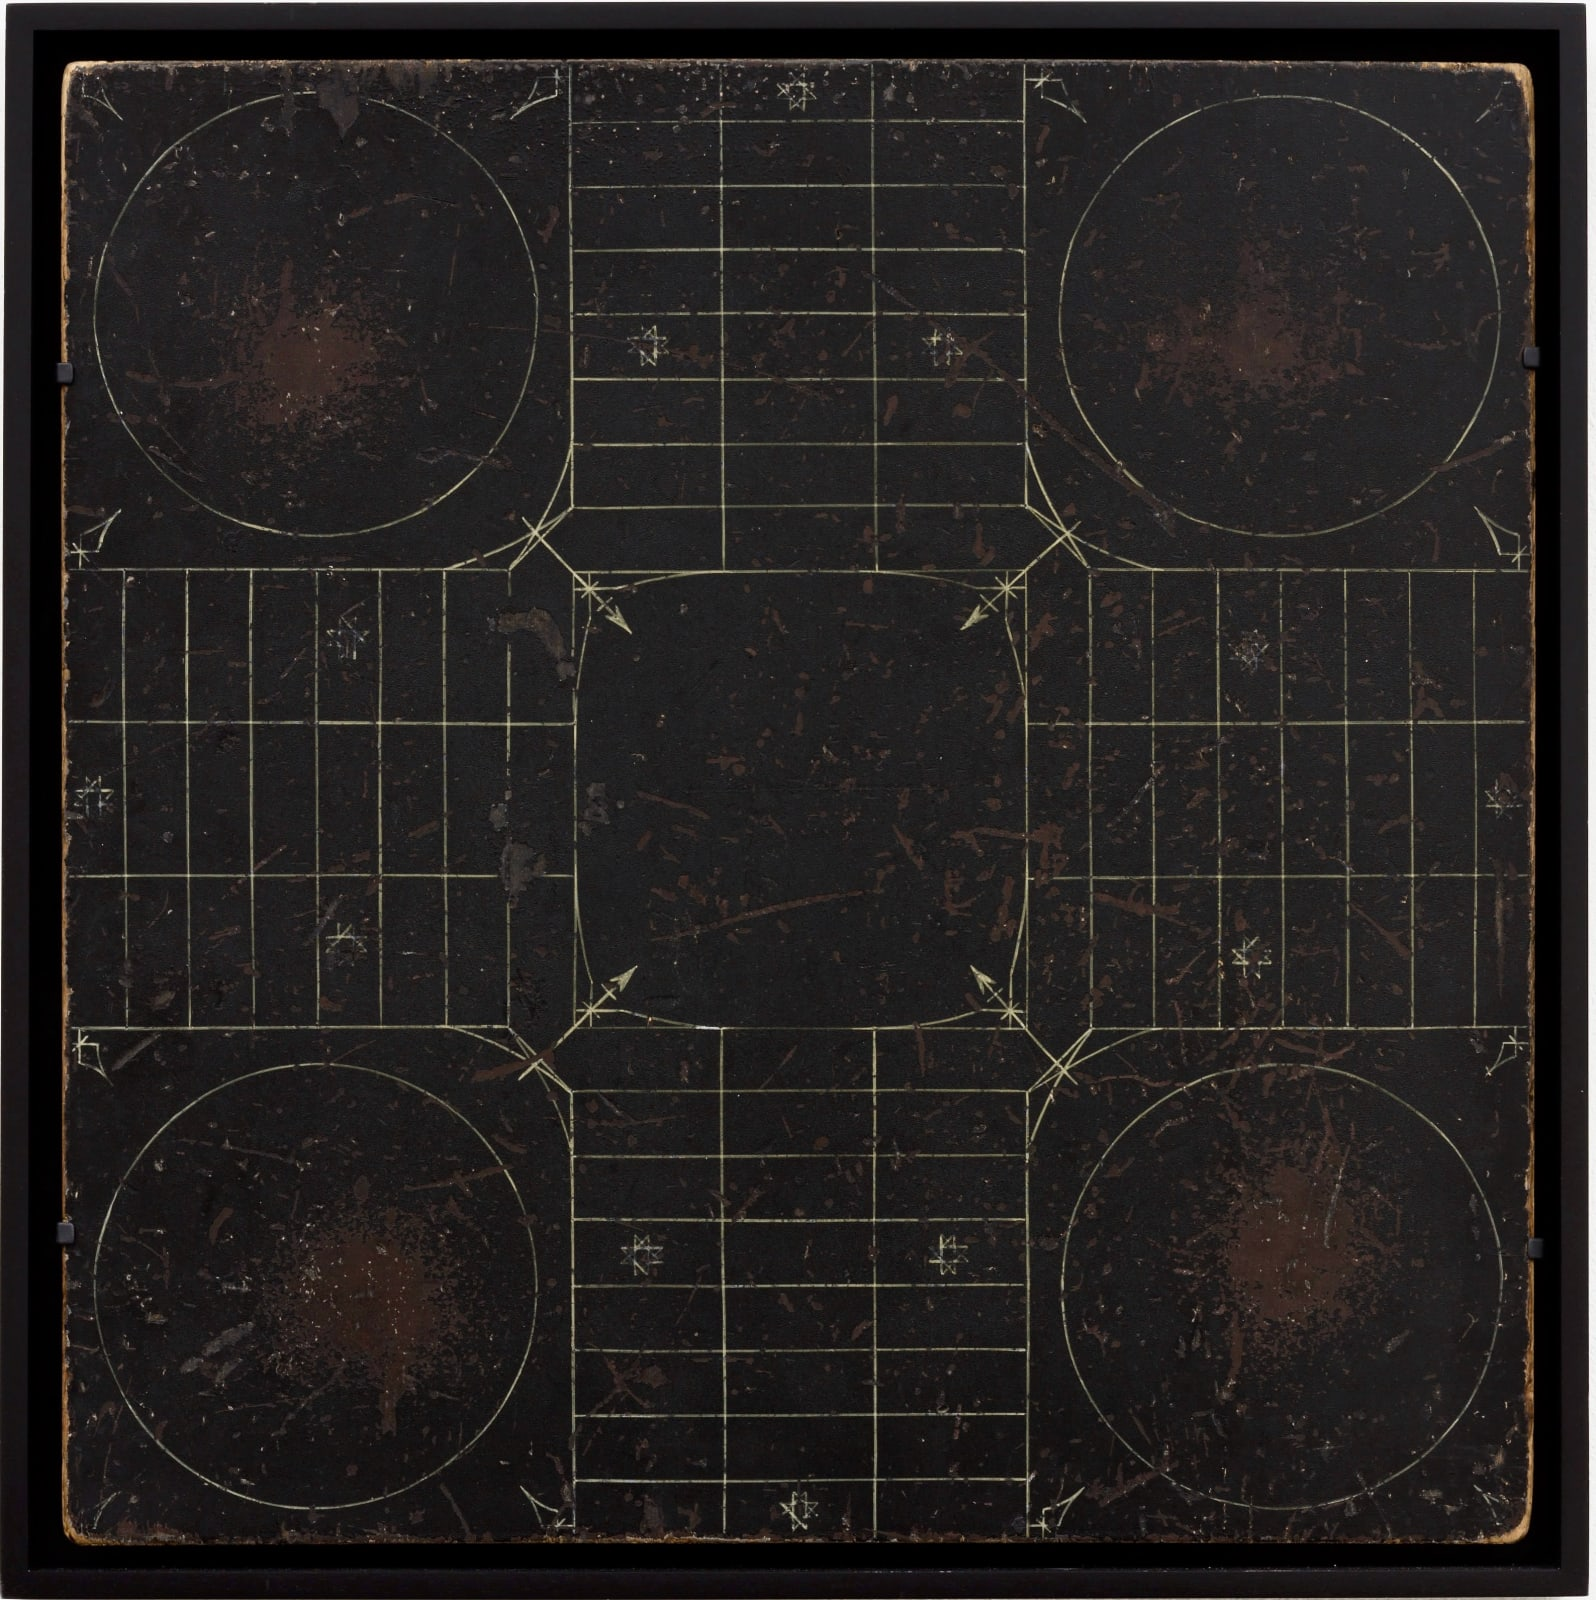 PARCHEESI GAME BOARD, LATE 19TH CENTURY Oil enamel on wood panel 19 3/4 x 19 3/4 in. 50.2 x 50.2 cm. (AU 241)